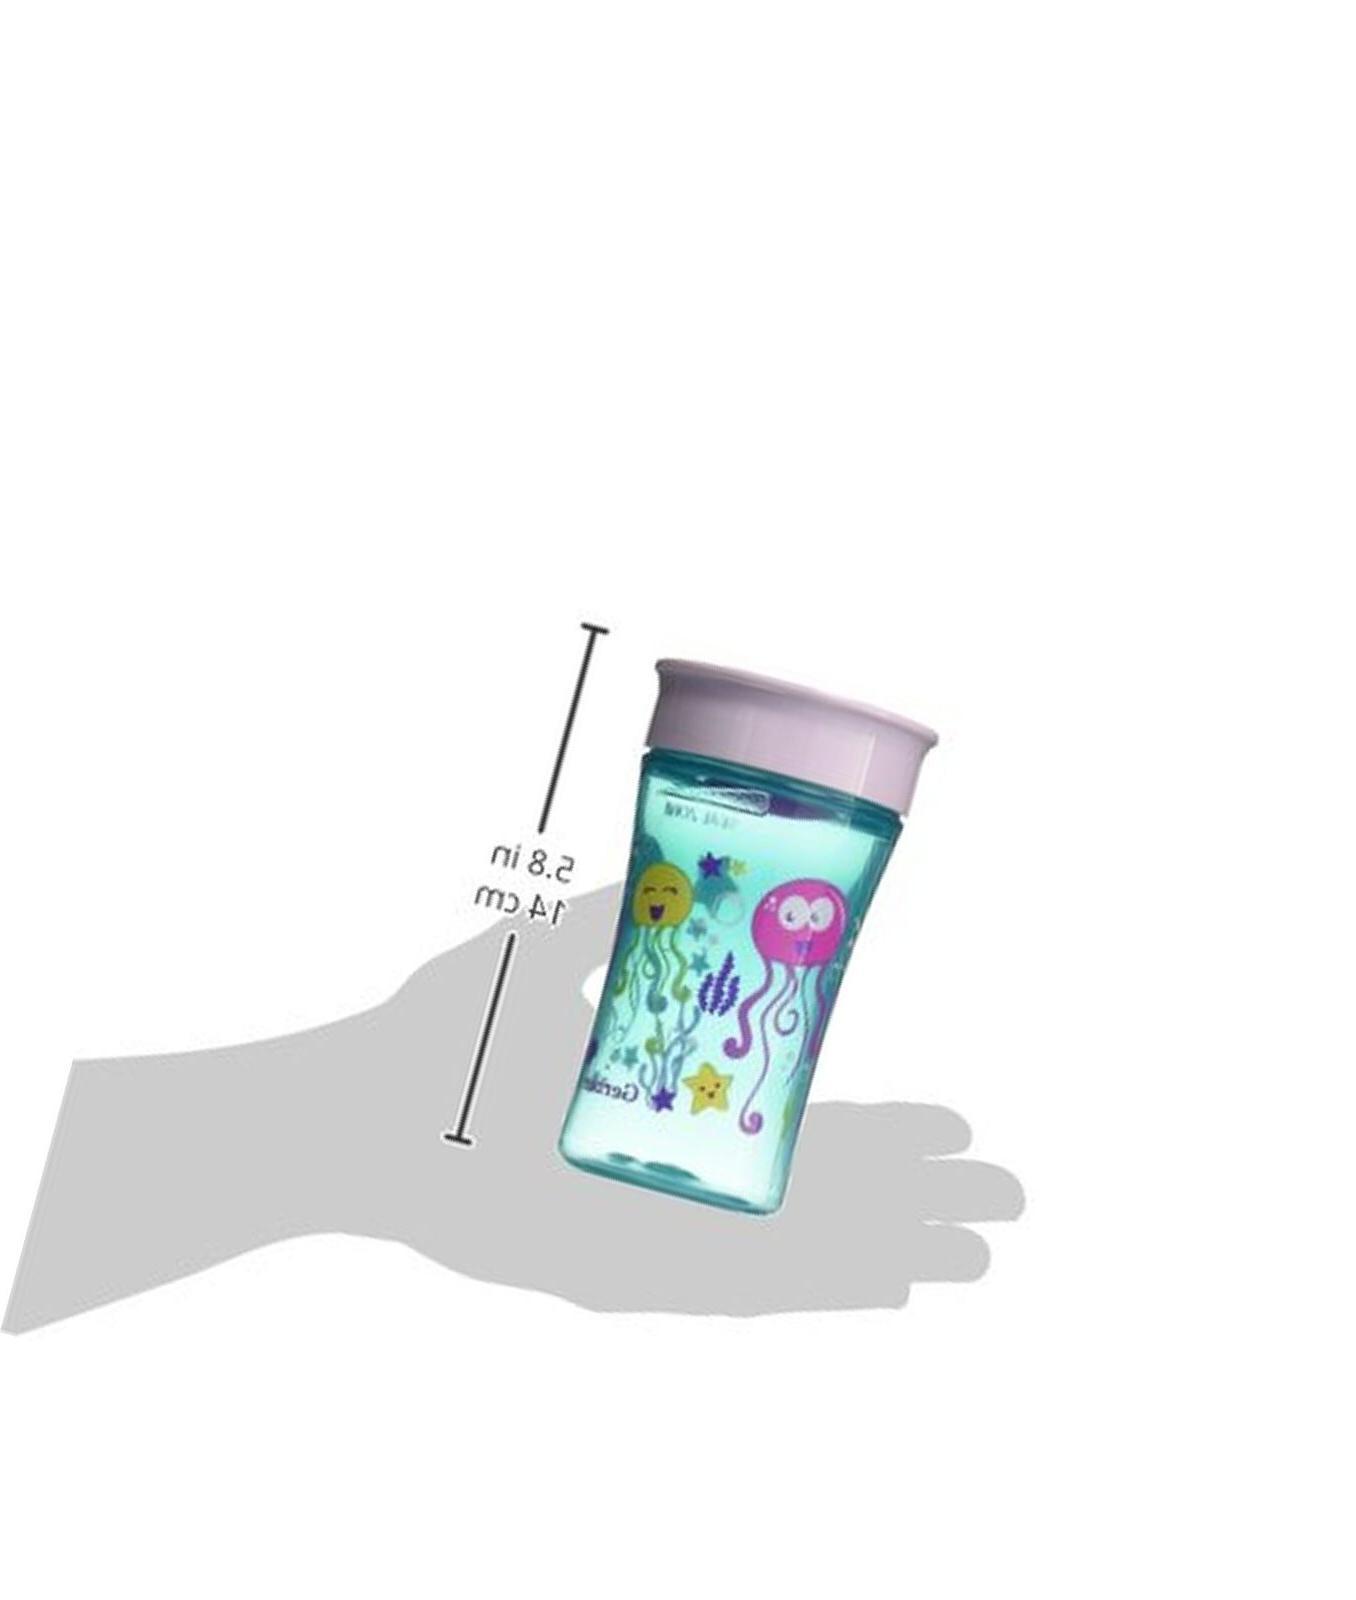 NUK Sippy Cup, 1pk Designs May